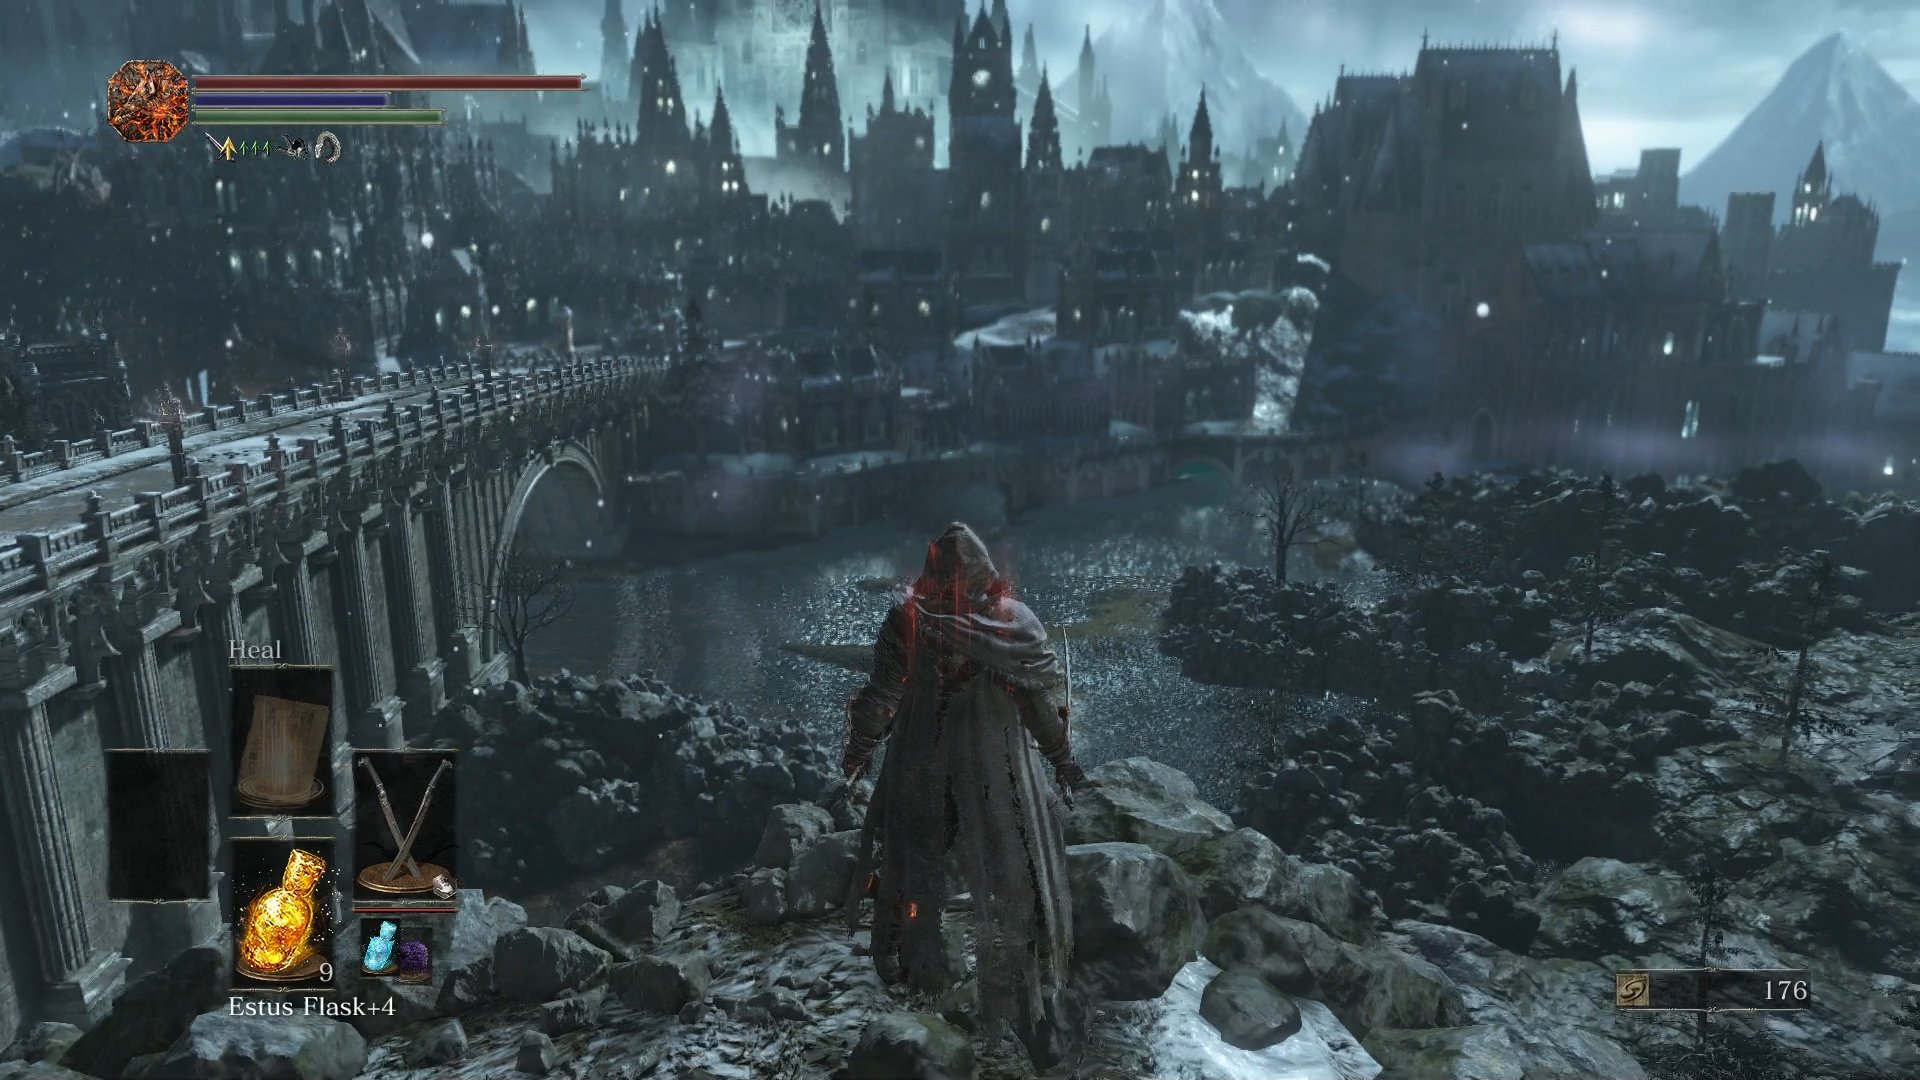 Dark Souls III [PC] [Full] [Español] [MEGA] - Solo Por MEGA